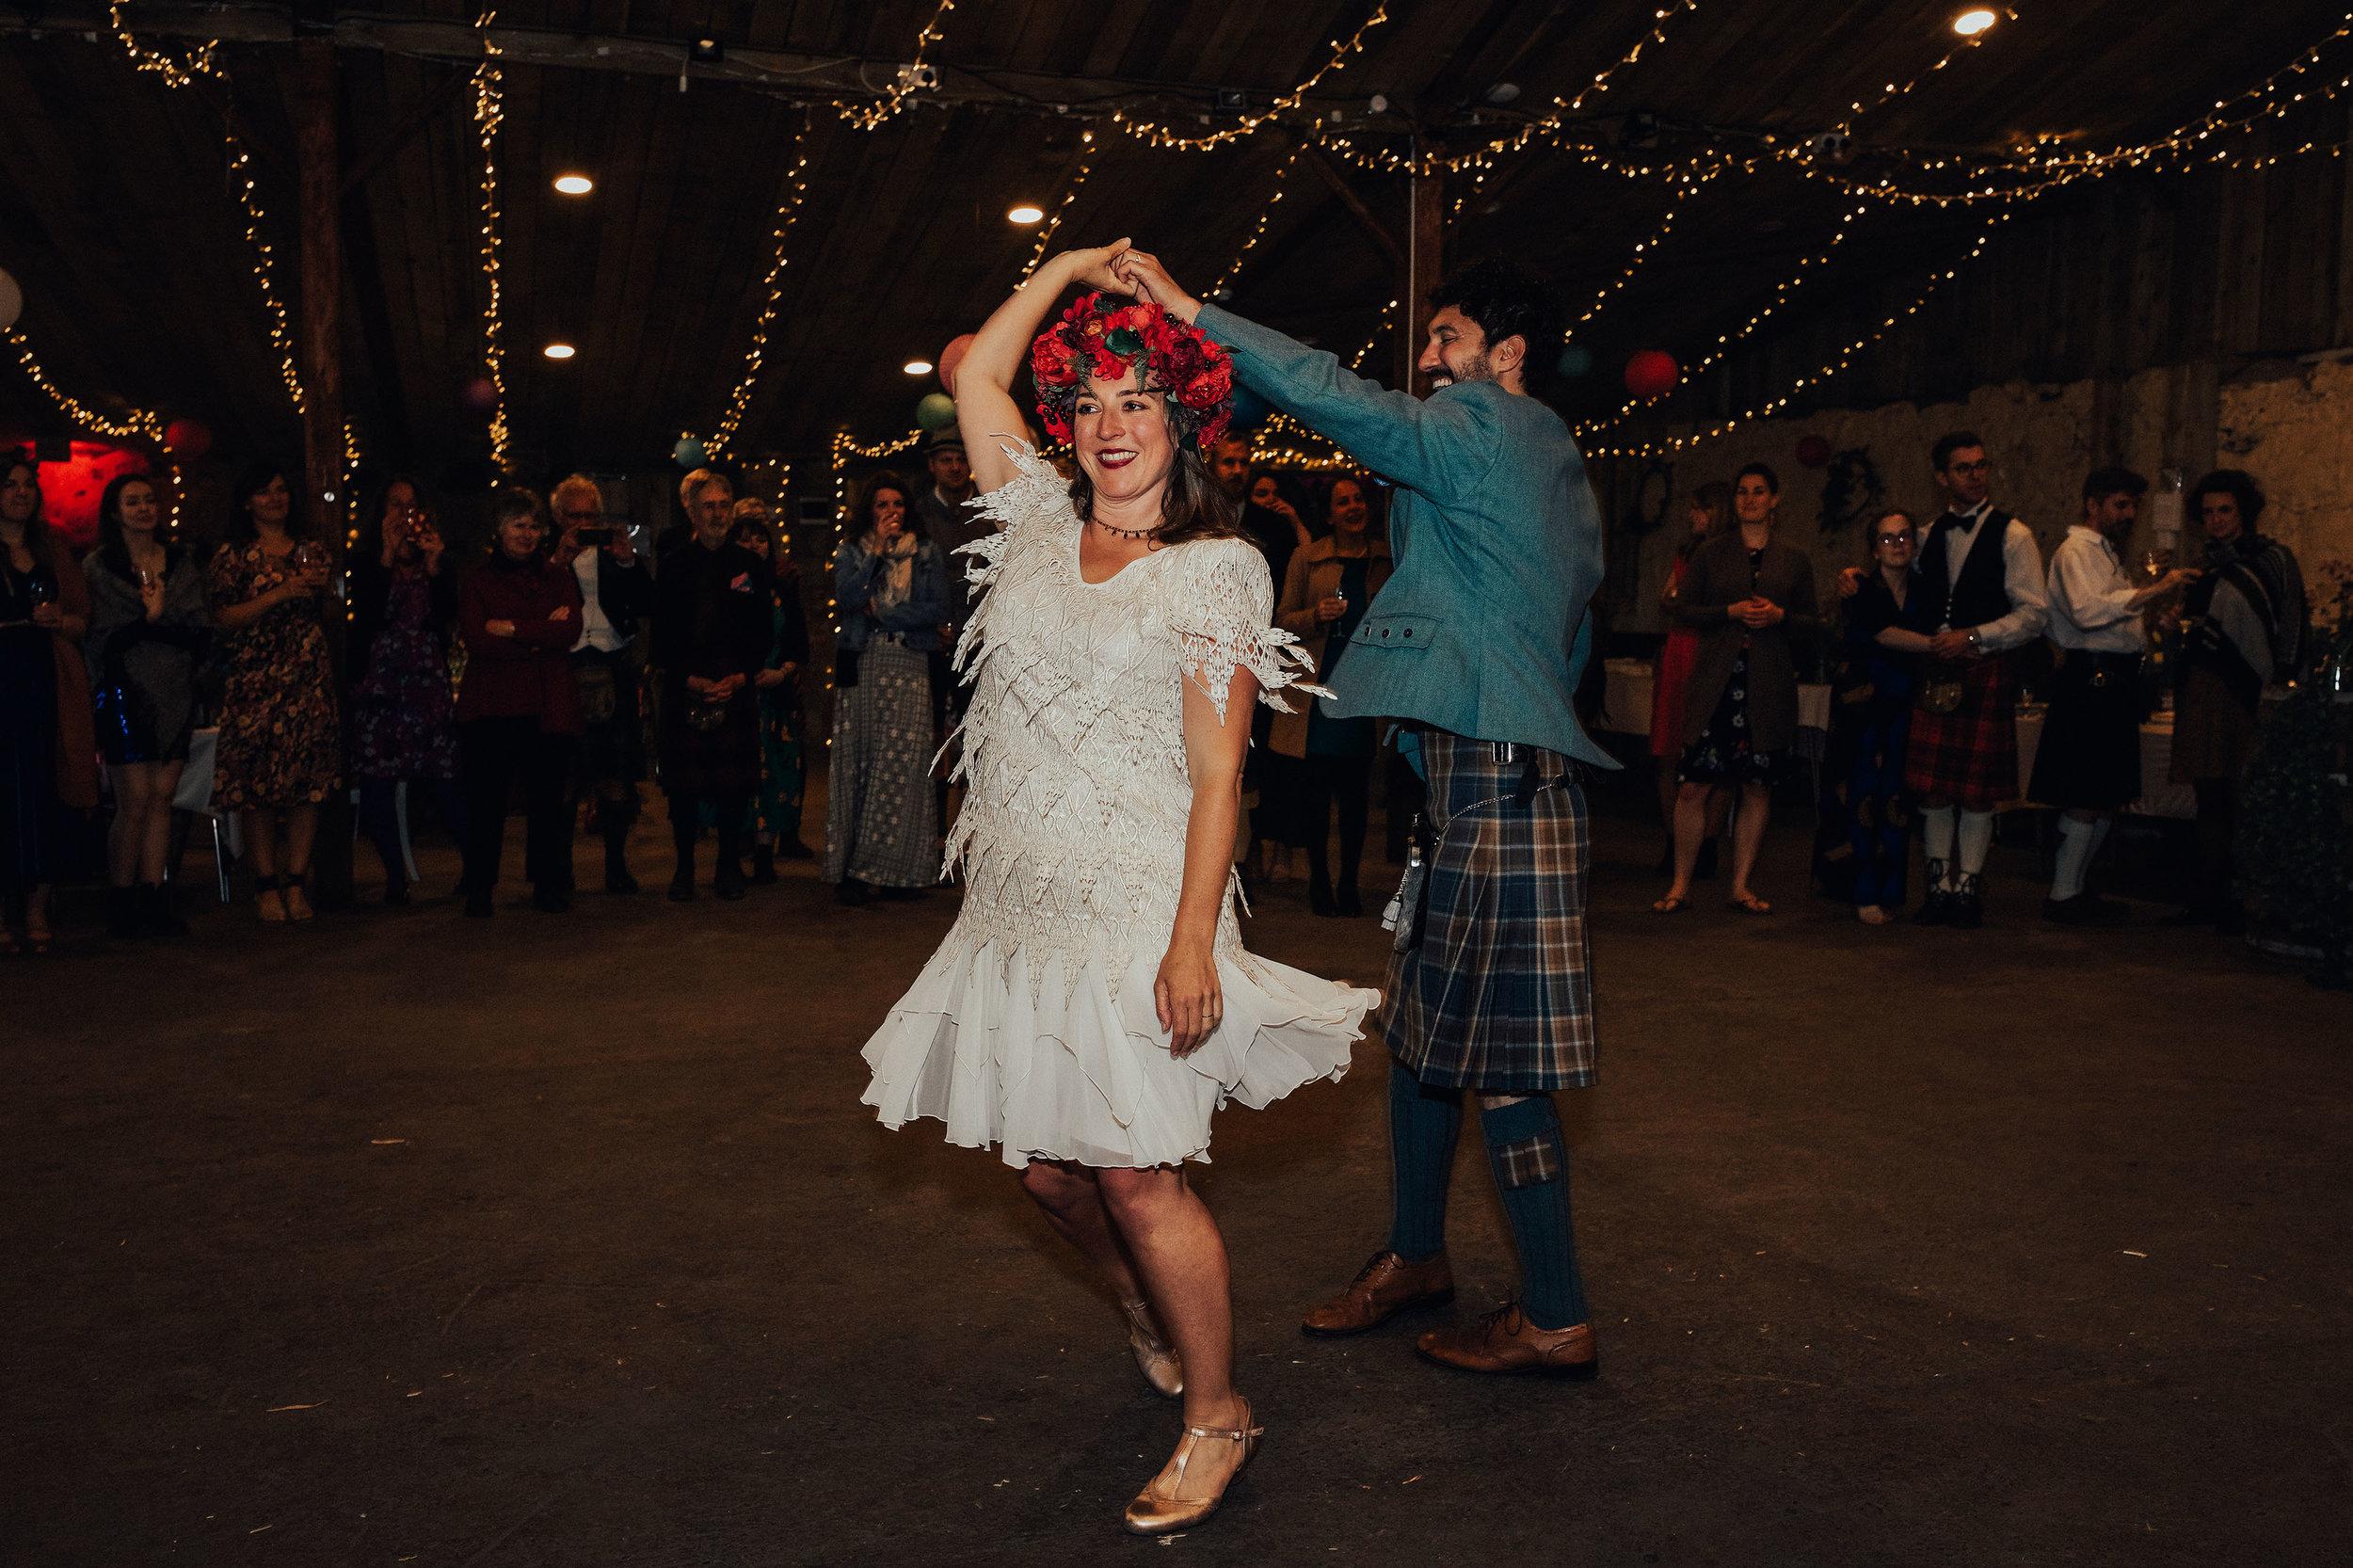 COMRIE_CROFT_WEDDINGS_PJ_PHILLIPS_PHOTOGRAPHY_169.jpg